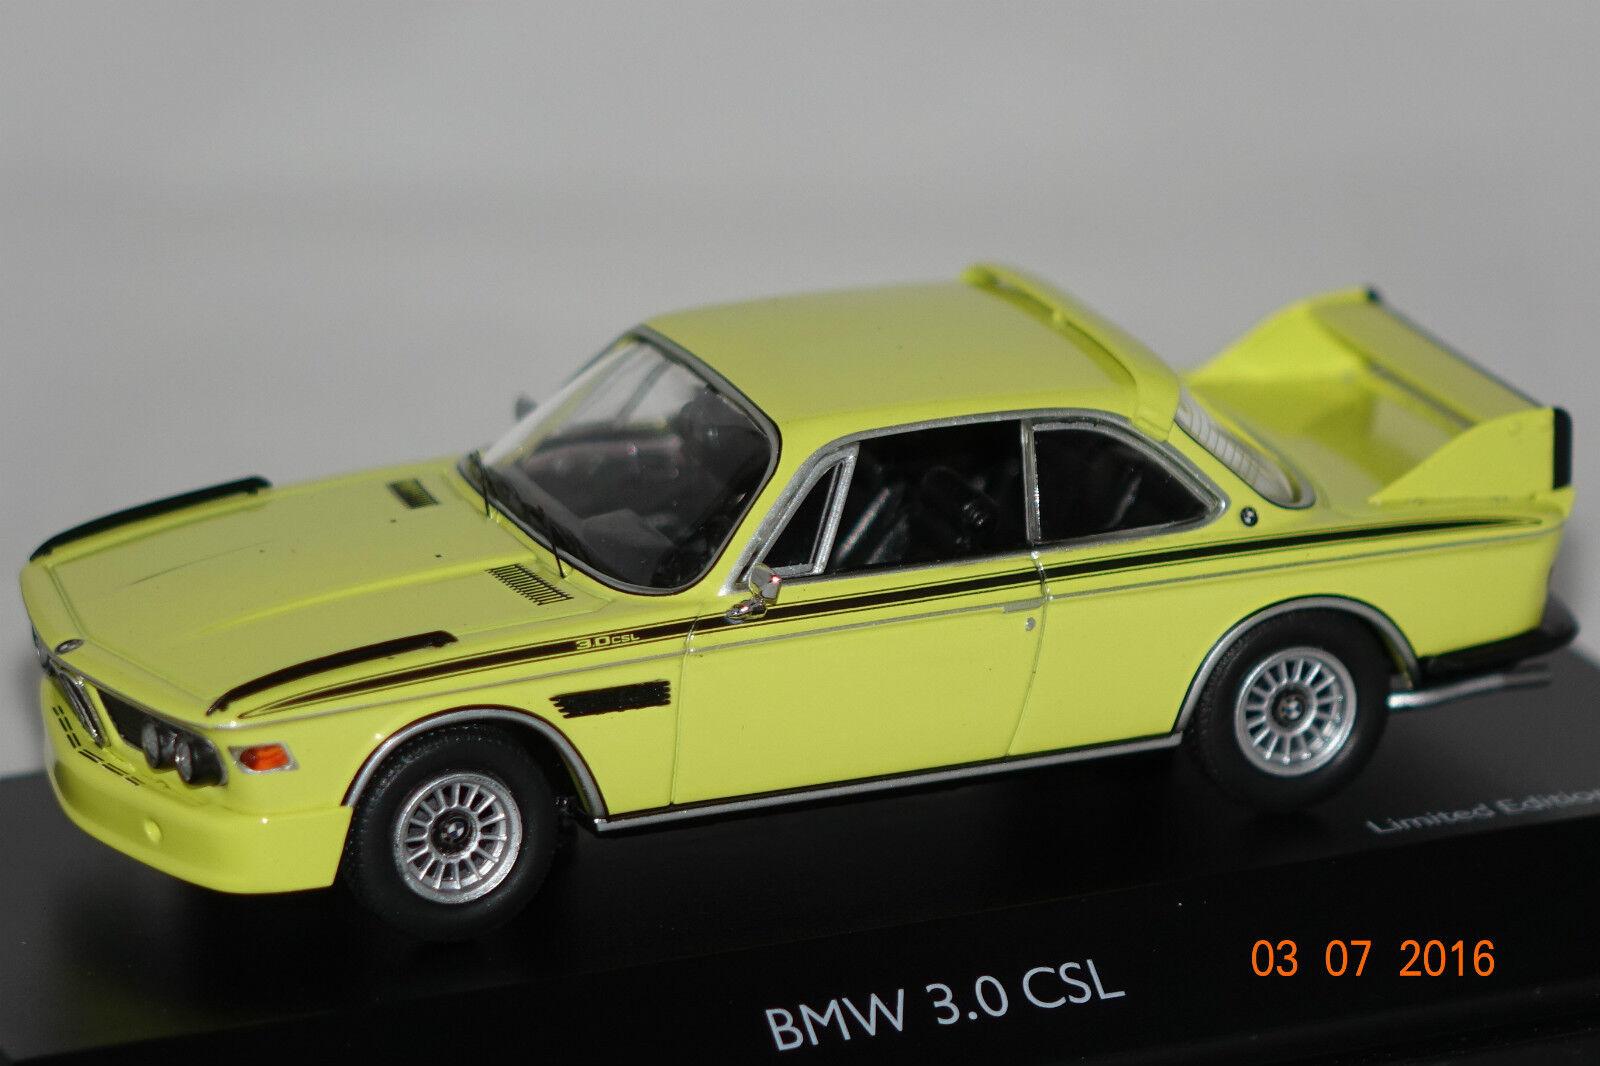 BMW 3,0 CSL jaune 1 43 schuco NOUVEAU & OVP 2190